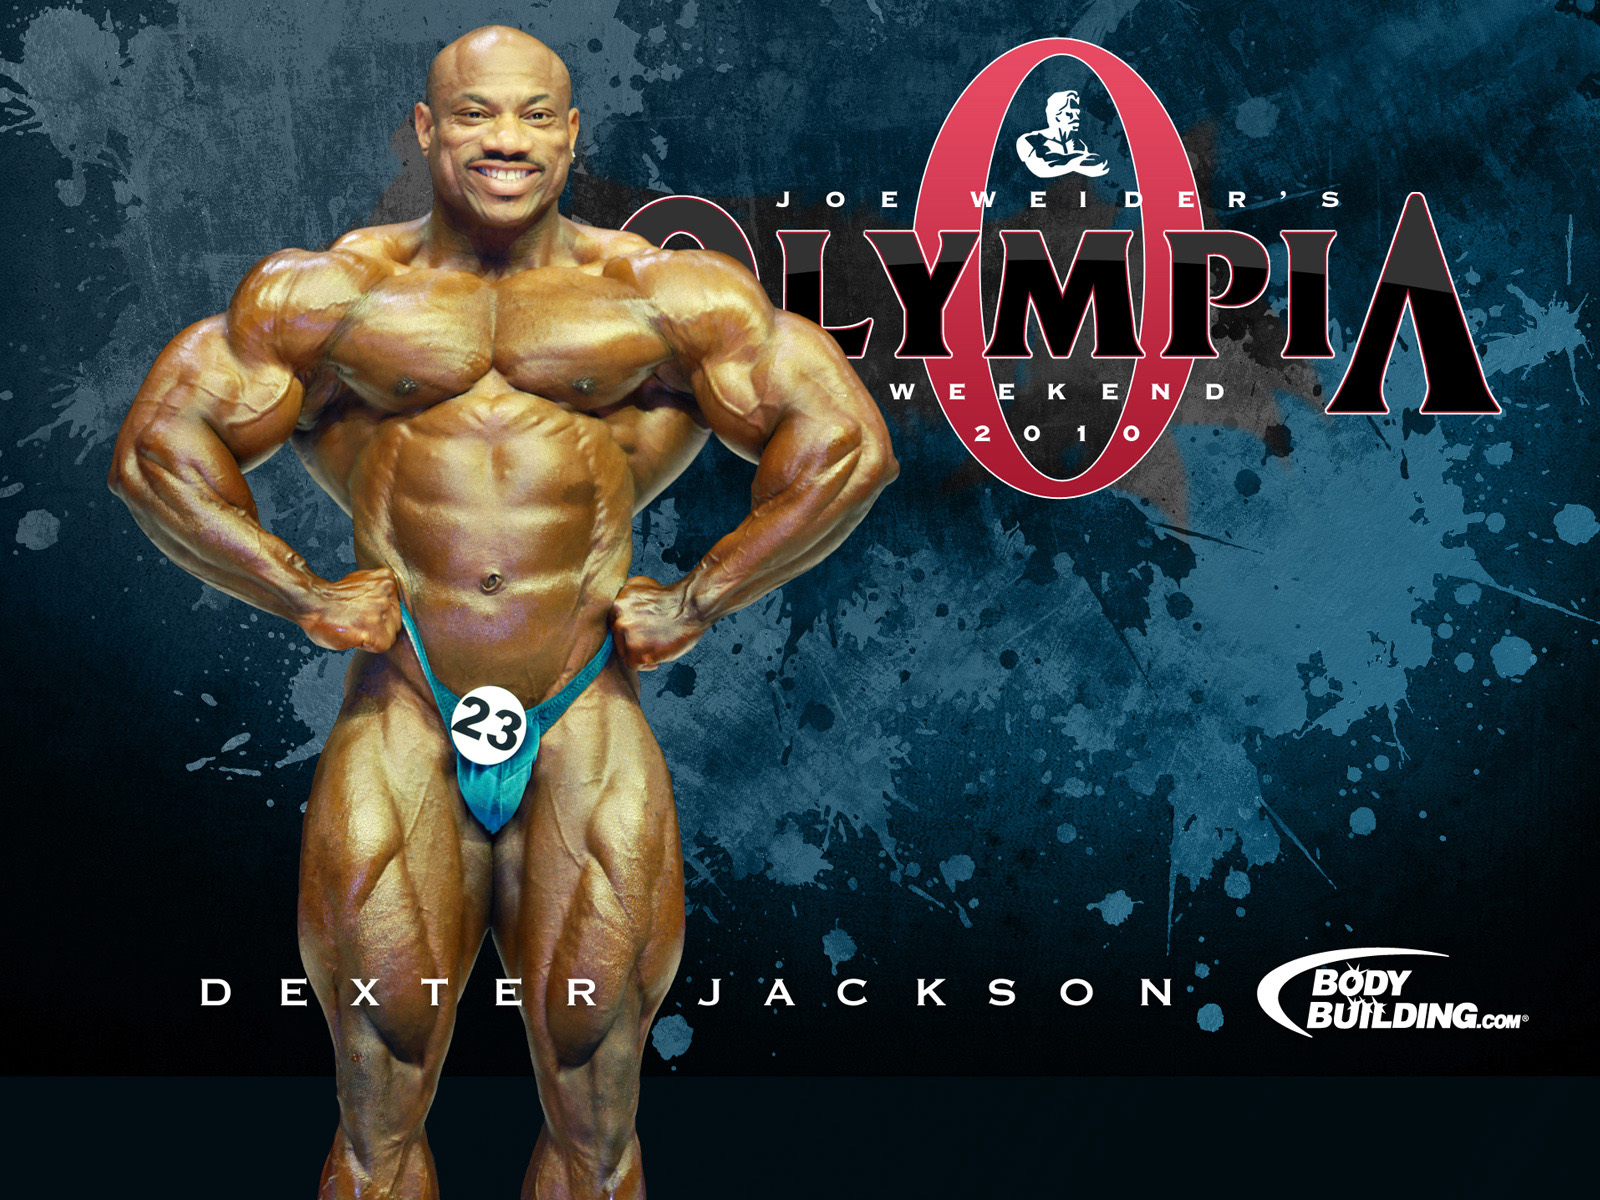 http://3.bp.blogspot.com/_-fyssgE5sr8/TSHmlmelKCI/AAAAAAAAAd0/hcpCkthNd2g/s1600/mr+olympia+Dexter+jackson+wallpaper.jpg